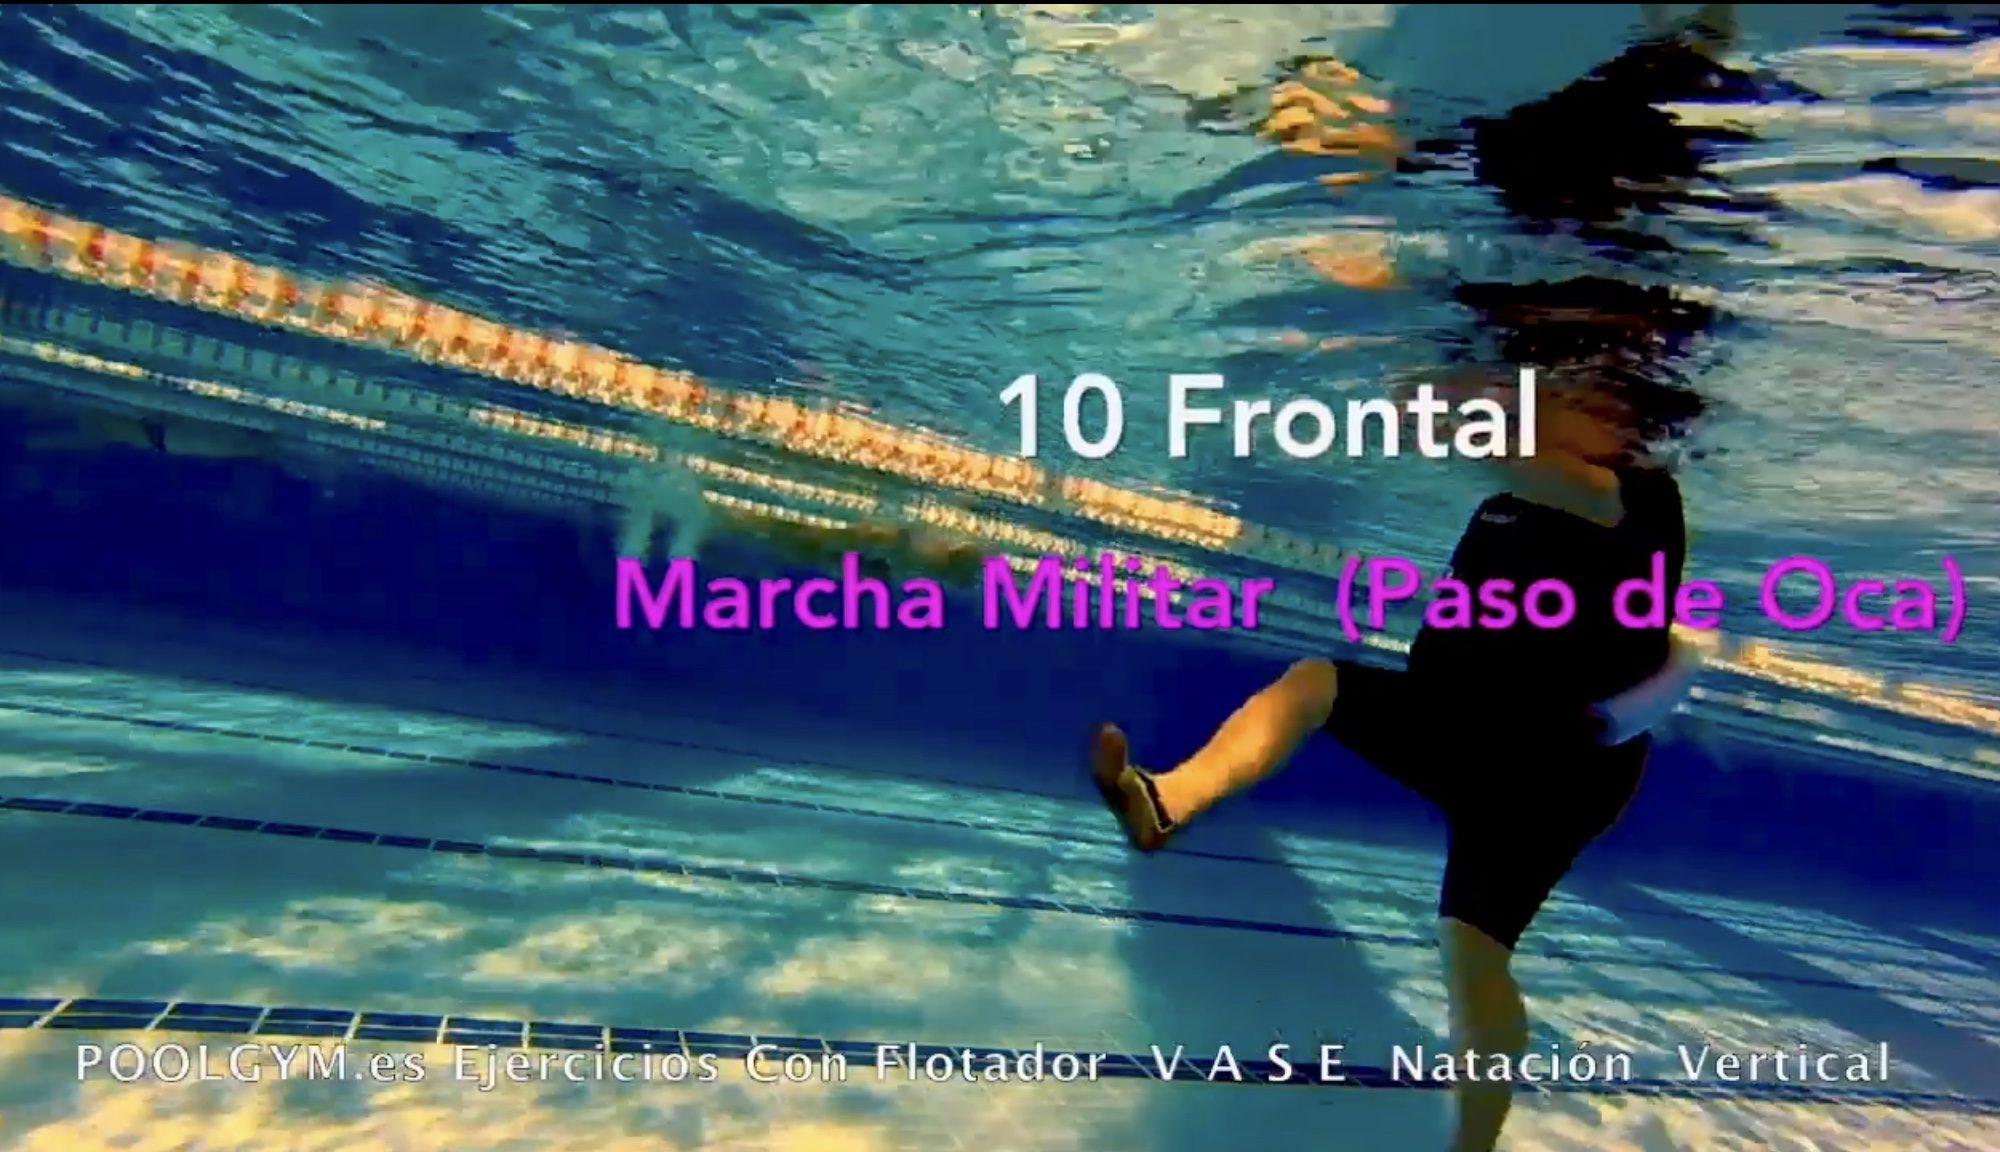 10 Frontal MARCHA MILITAR poolgym.ES